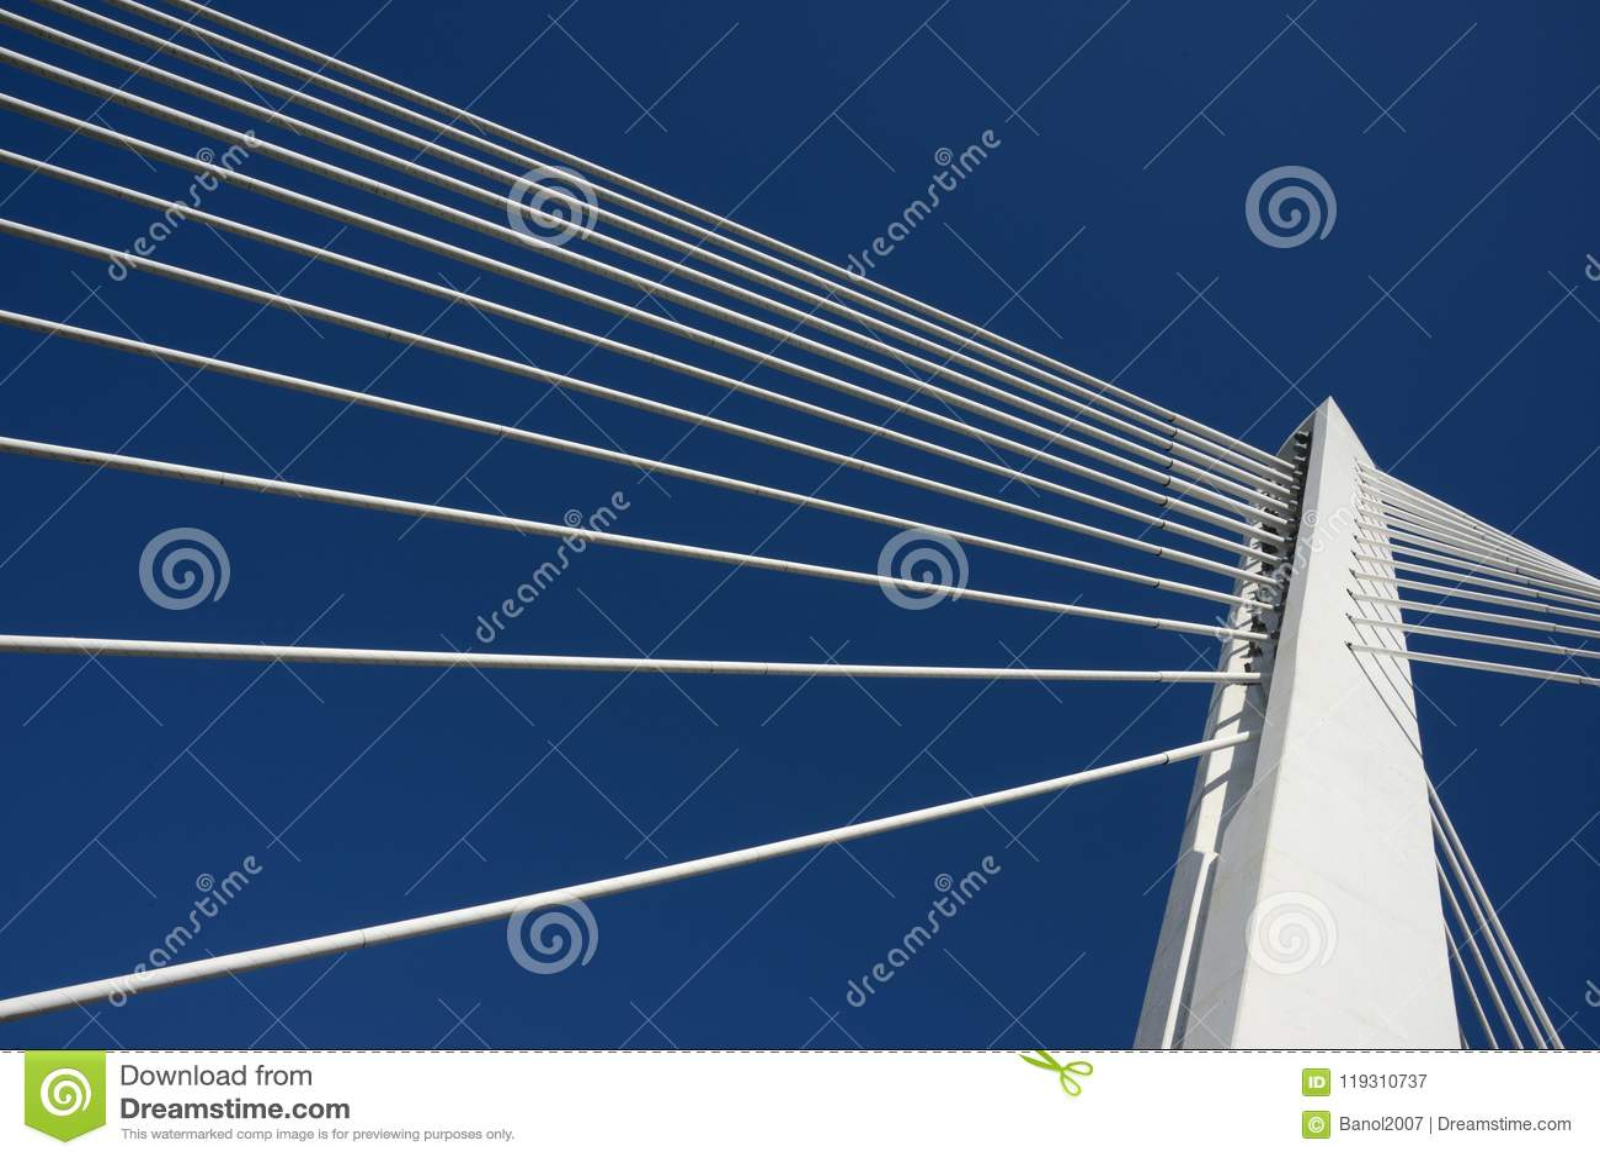 Top bridge pillar joining ropes, blue sky. Success.